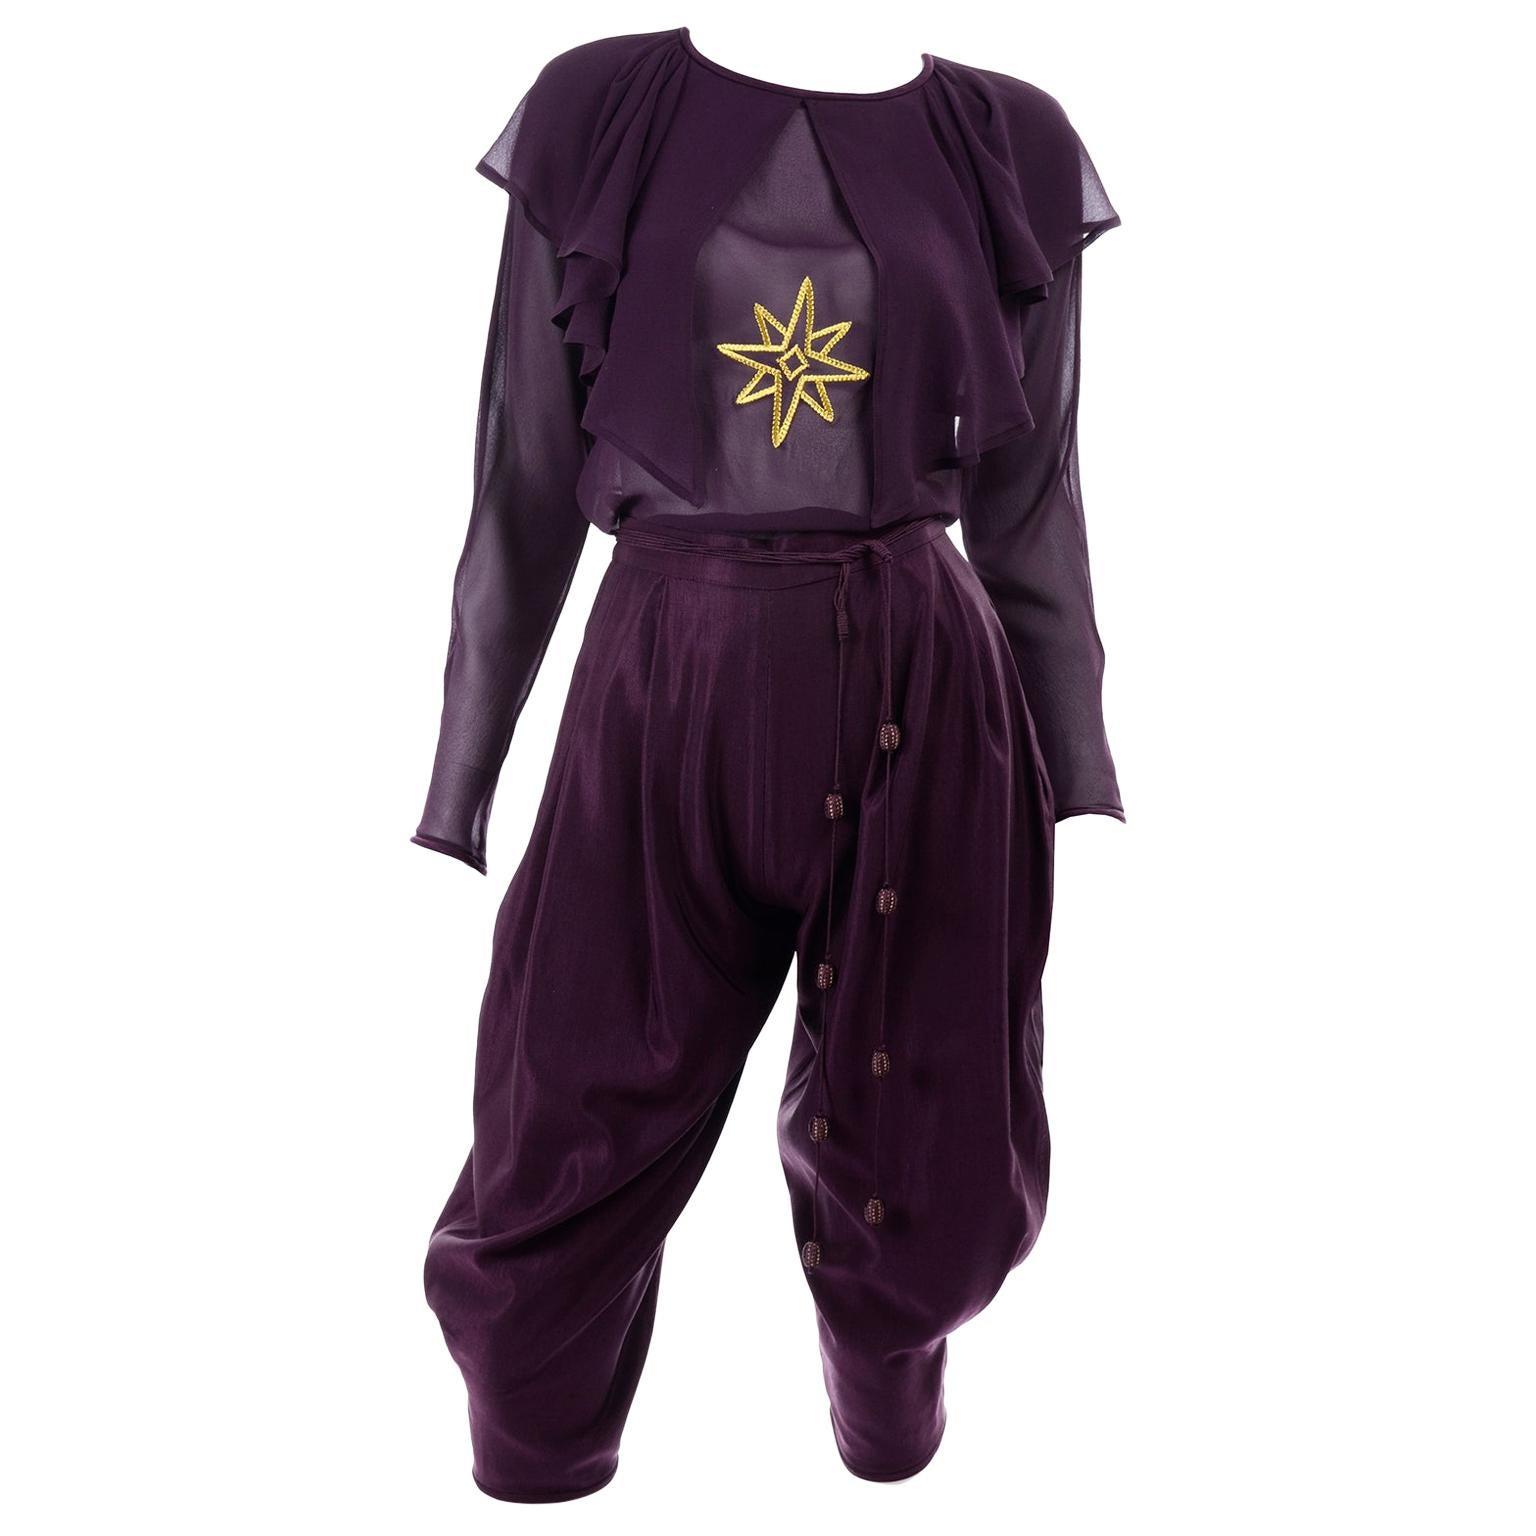 1981 Gianni Versace Vintage Purple Silk & Wool Jodhpurs & Star Chiffon Top